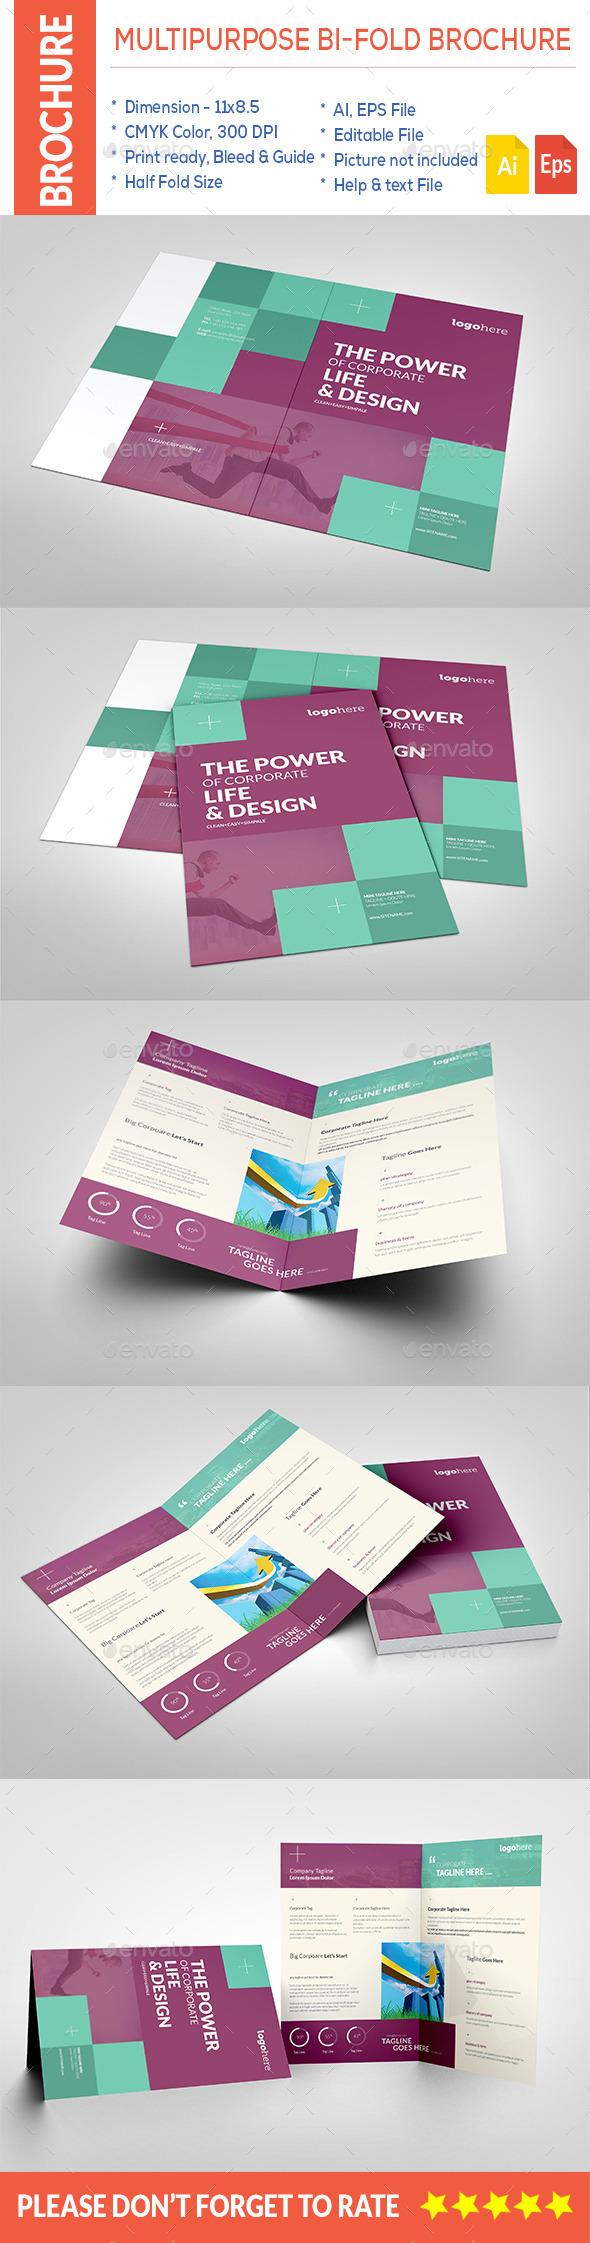 Multipurpose Bi-Fold Brochure - Corporate Brochures